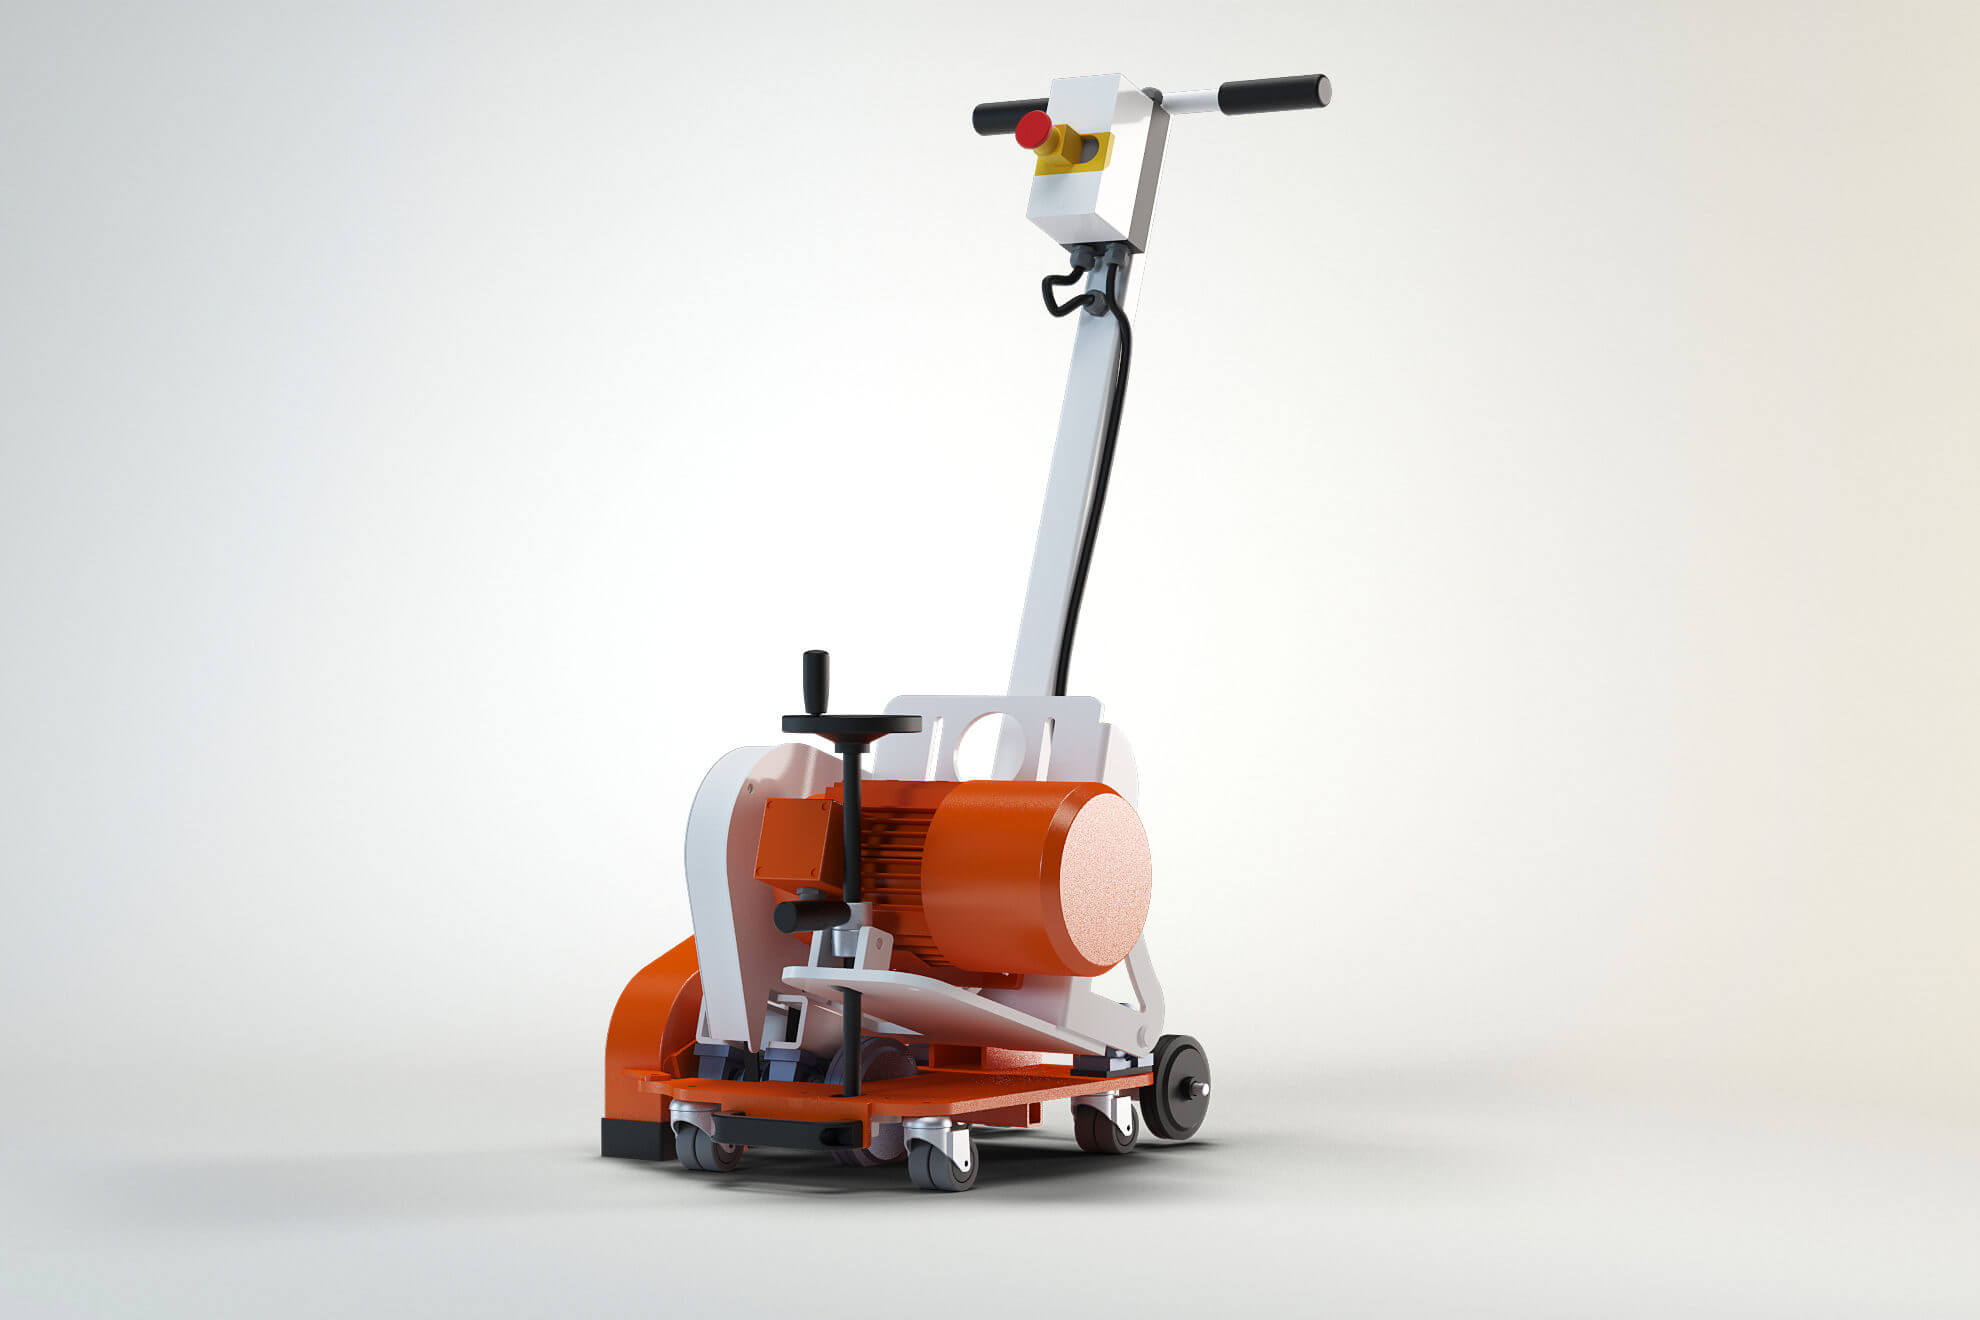 VLFR-Standaard2 Floor iQ